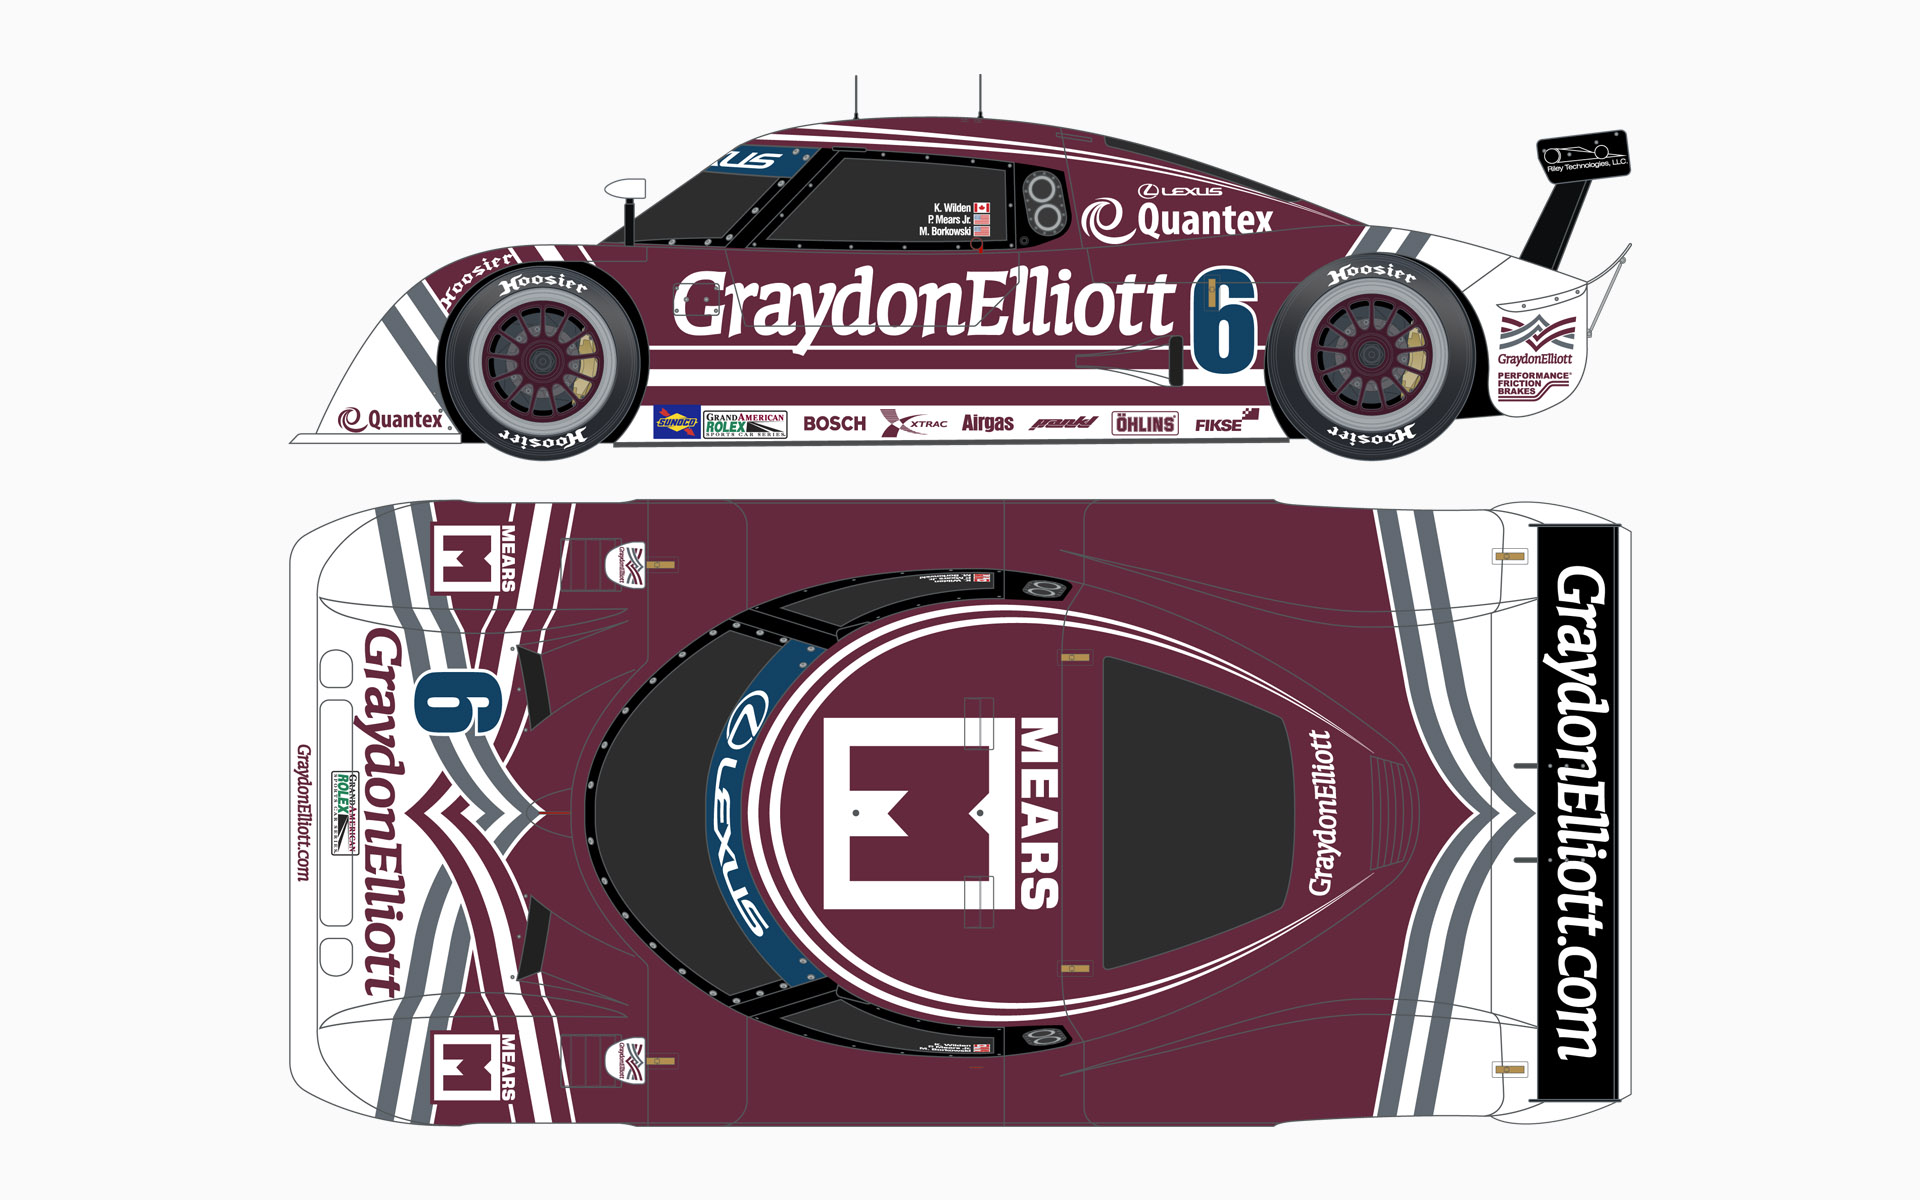 Michael Shank Racing Graydon Elliott Riley MKXI Daytona Prototype Livery Elevations